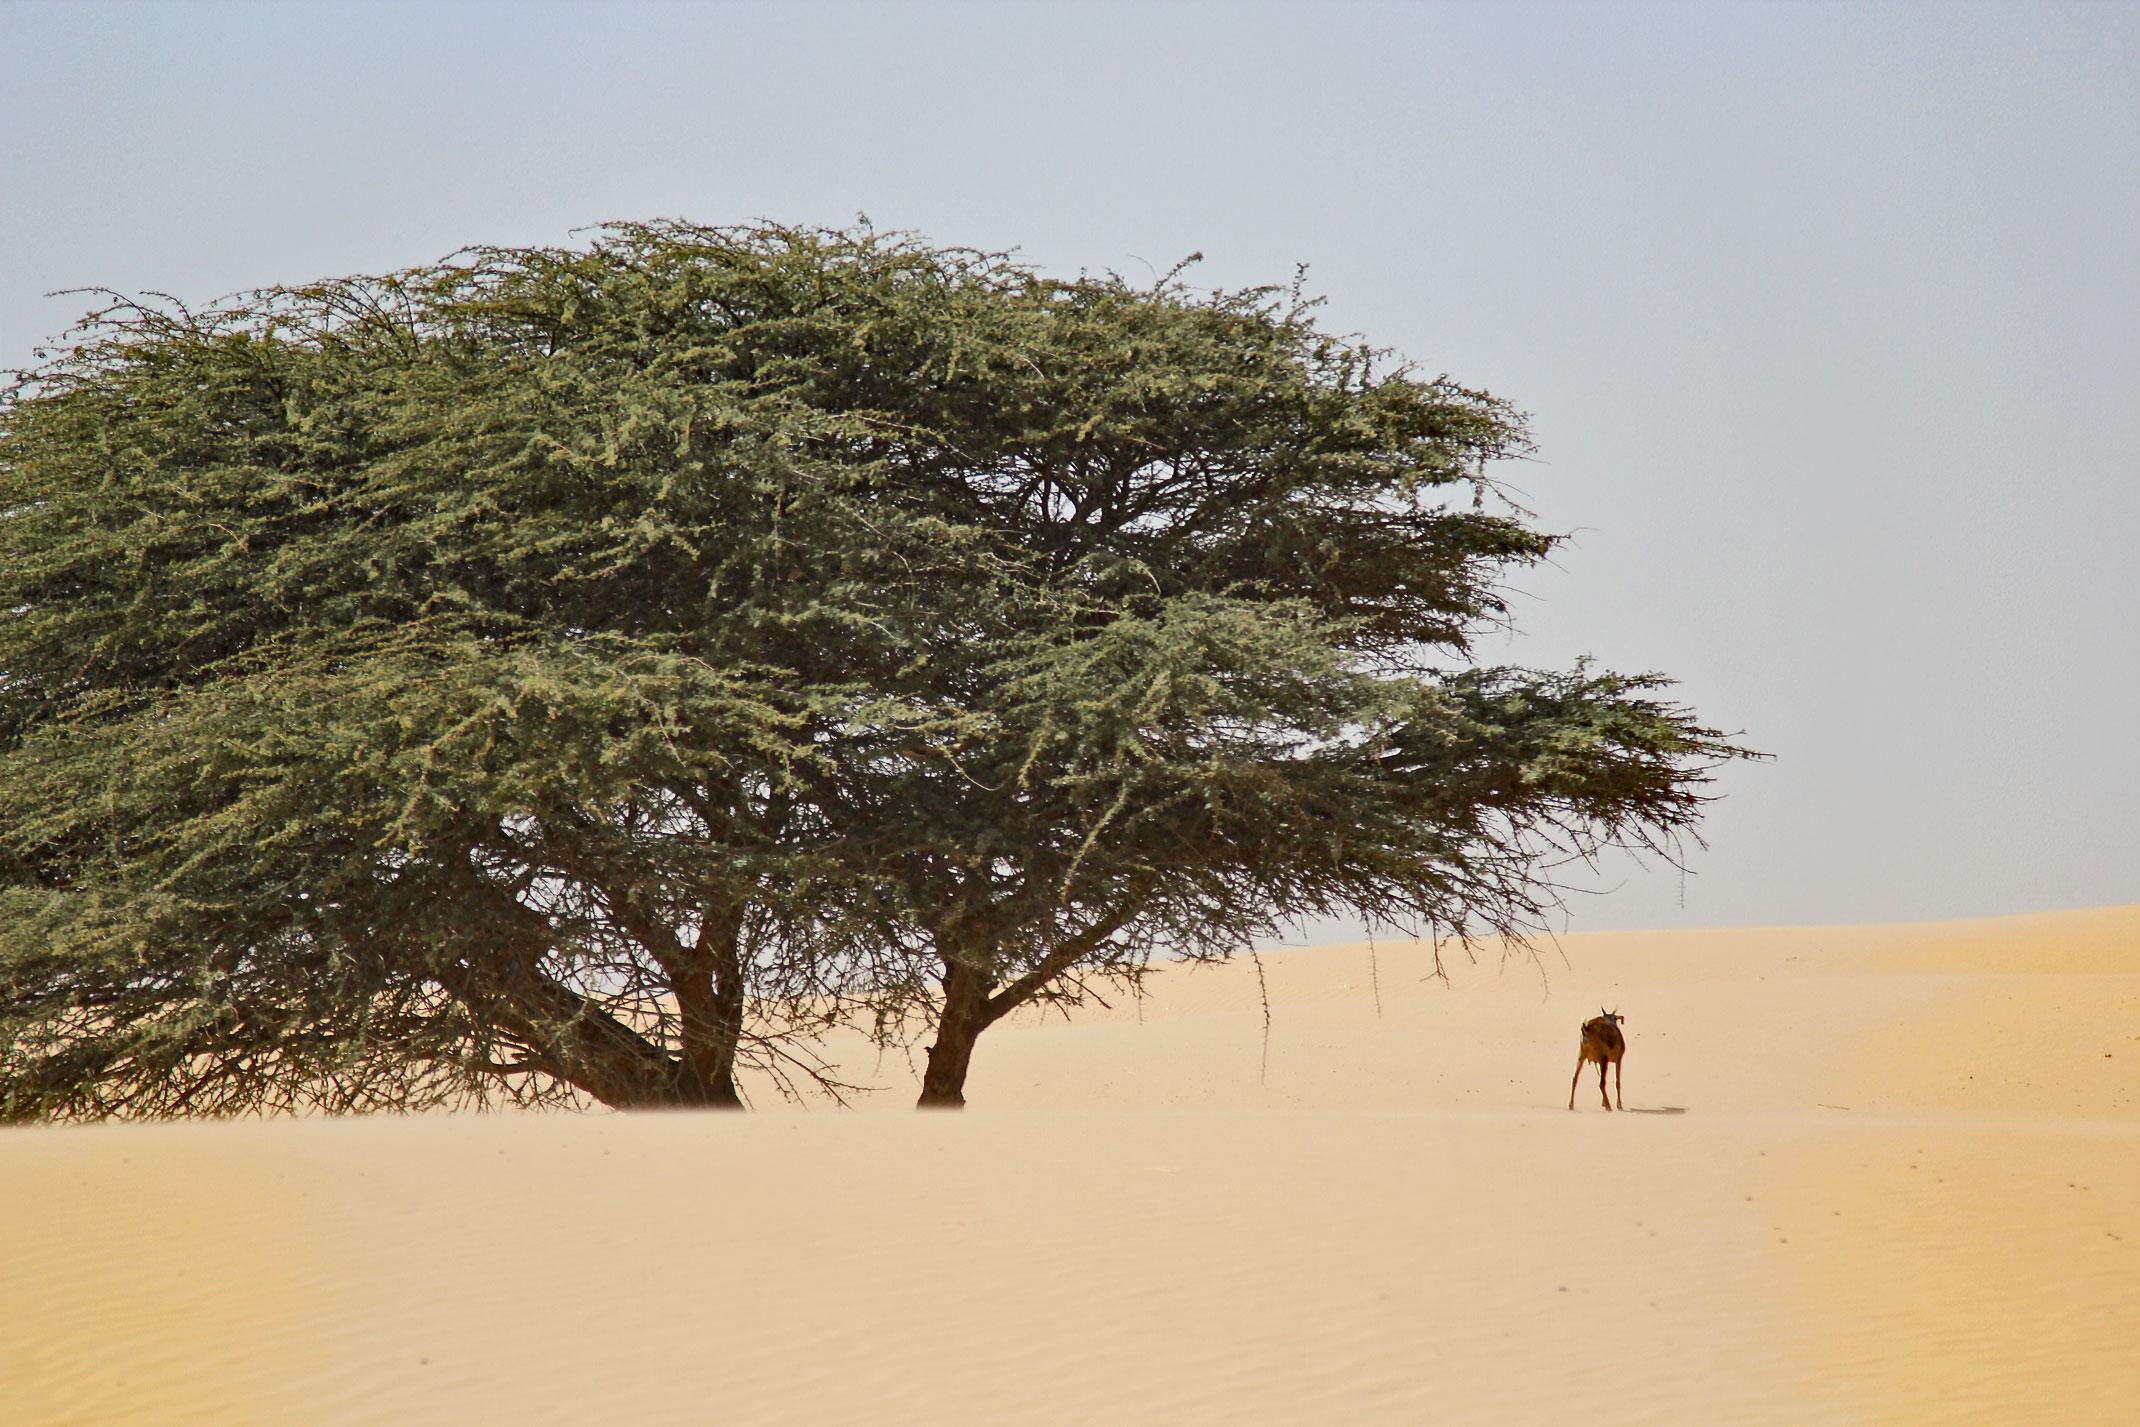 Mauretania.Pustynny piasek,drzewo i koza.